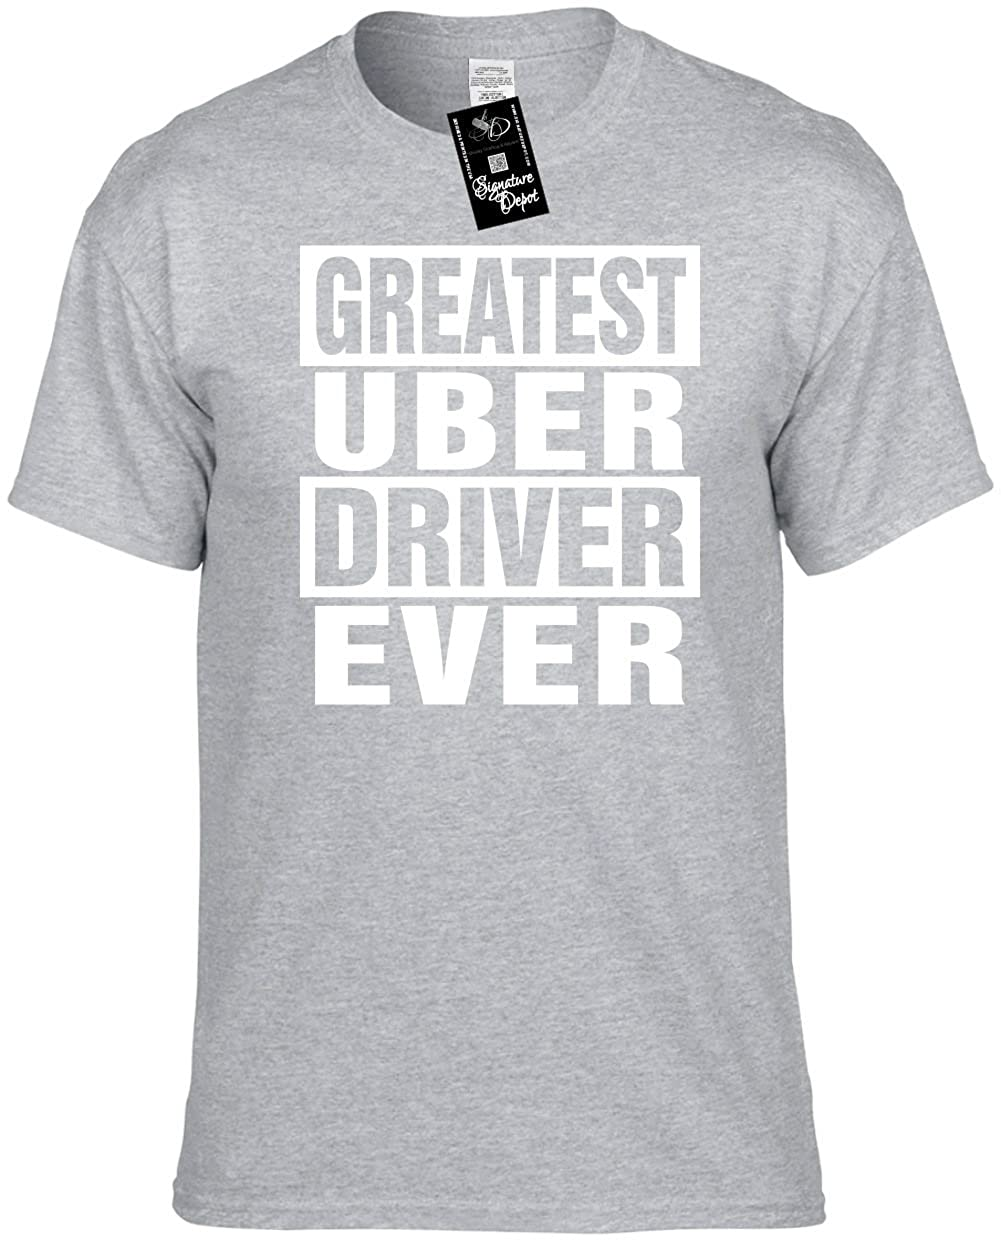 aac7cc3eeda Amazon.com  Mens Funny T-Shirt (Greatest UBER Driver Ever) Unisex Men s  Shirt  Clothing